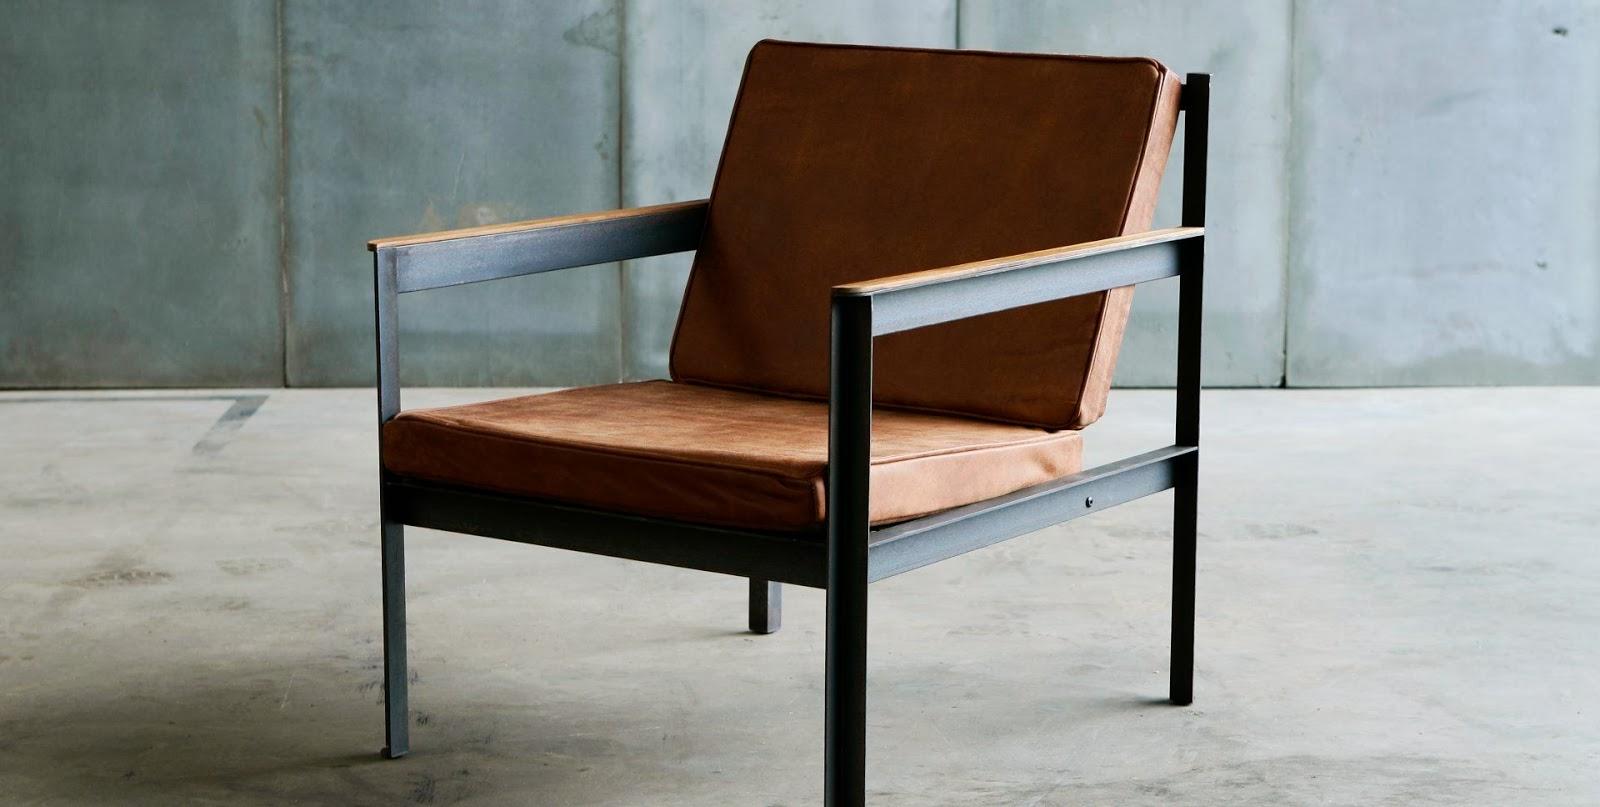 Dany 39 s hobbies lo stile industriale che scoperta di stile for Sessel industrial